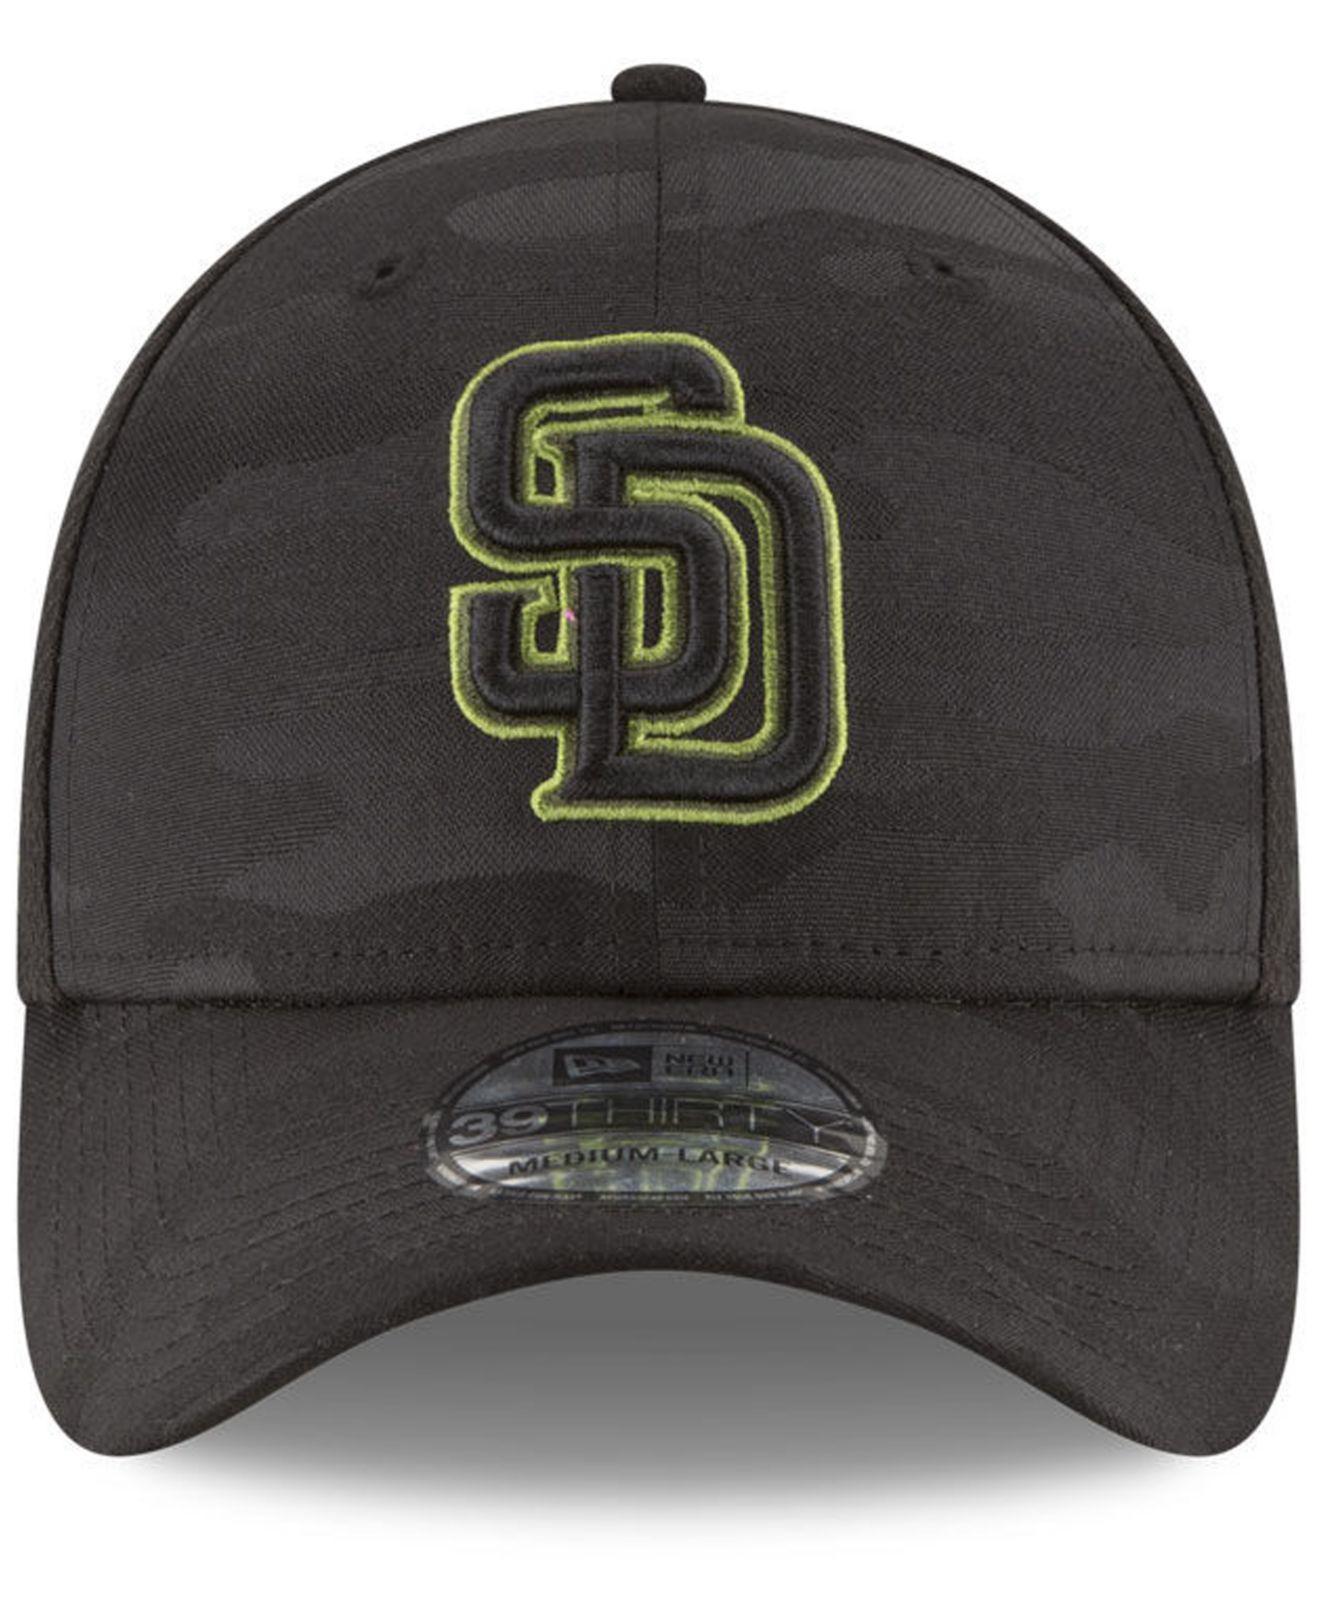 timeless design a5271 a2719 ... cheap lyst ktz san diego padres memorial day 39thirty cap in black for  men 283f9 b1eca